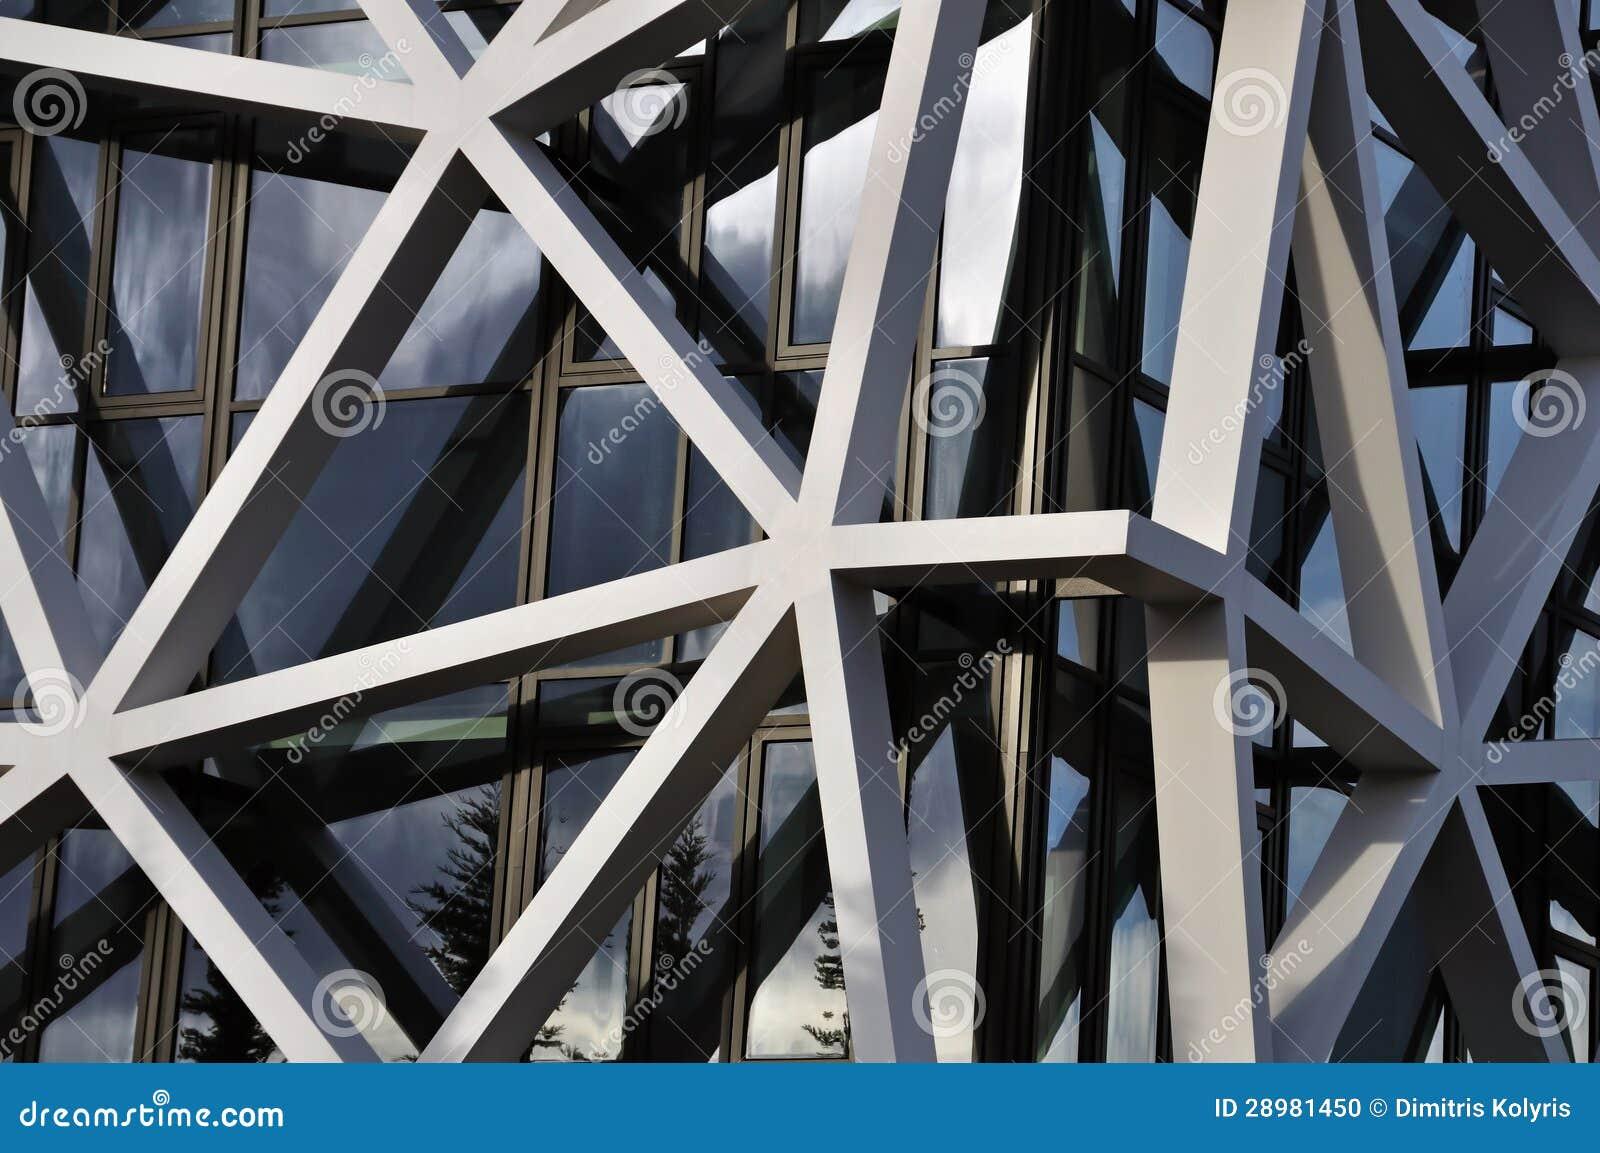 Building Facade With Asymmetric Pattern Stock Photo ...